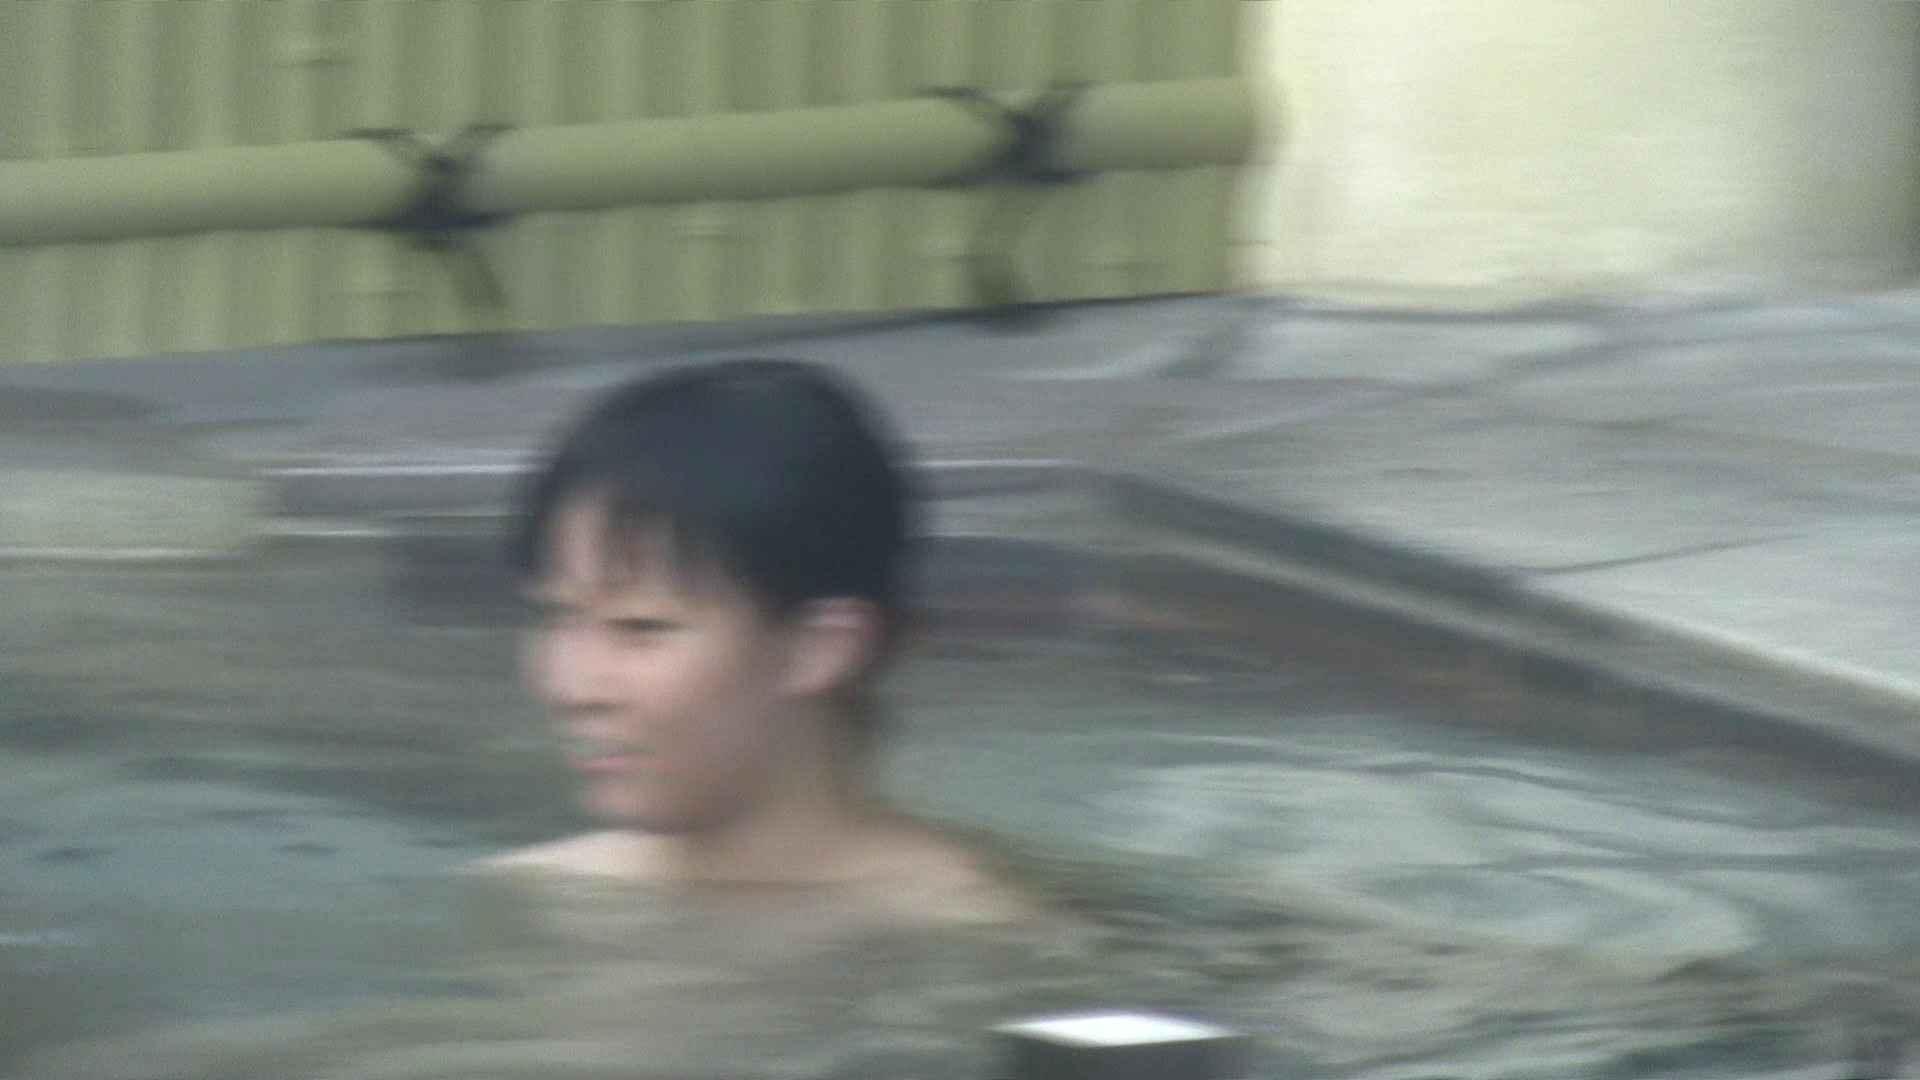 Aquaな露天風呂Vol.196 HなOL | 盗撮  91pic 10